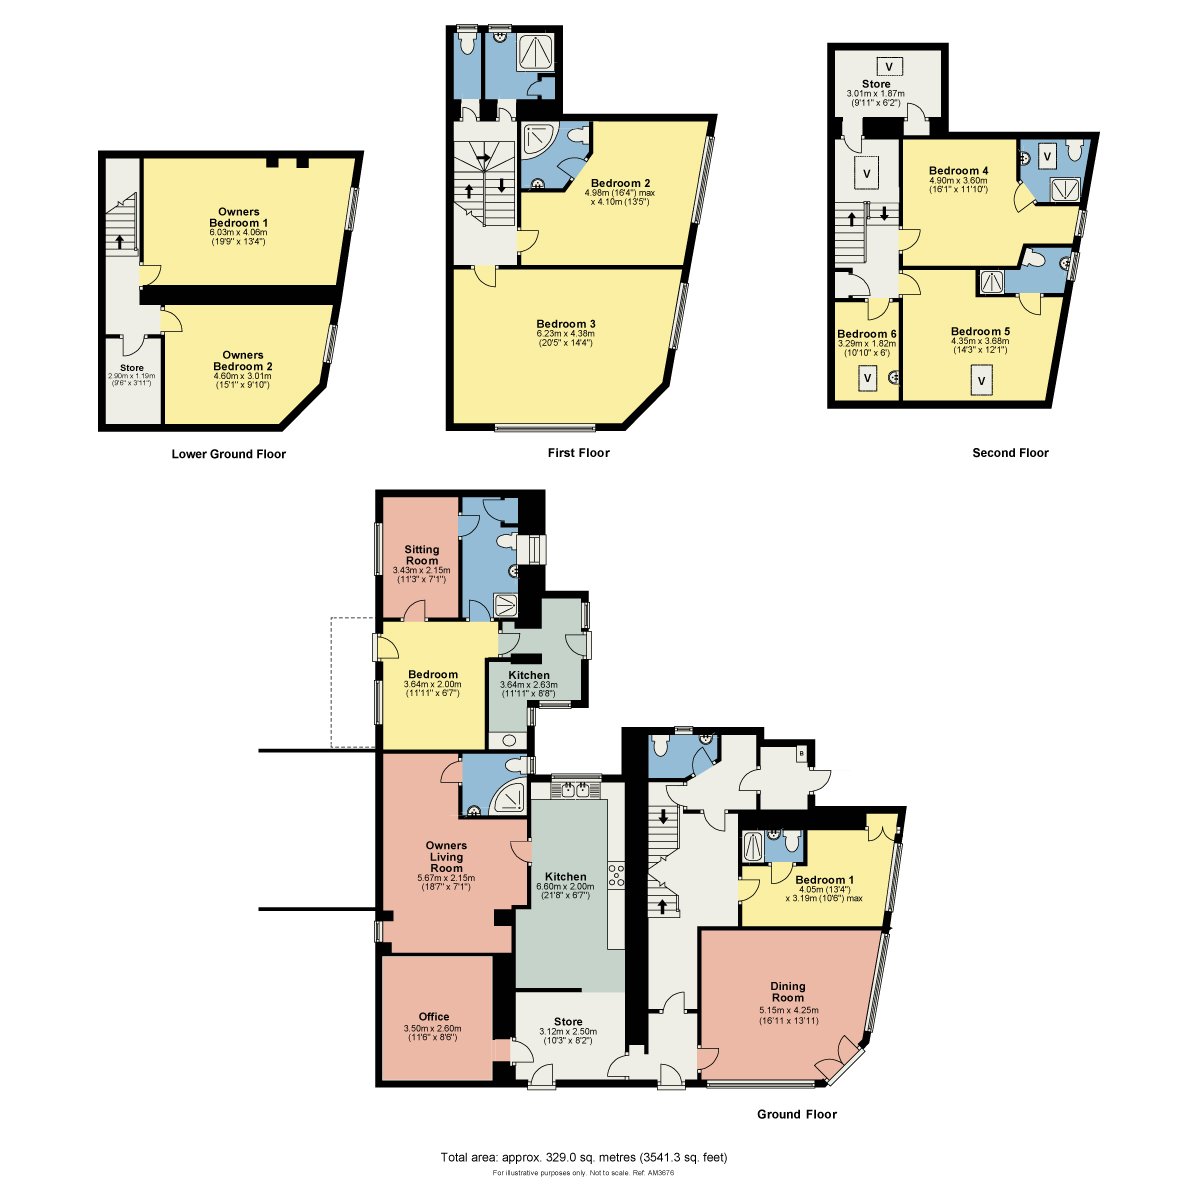 Floorplan Lacet House, Kelsick Road, Ambleside, Cumbria, LA22 0EA